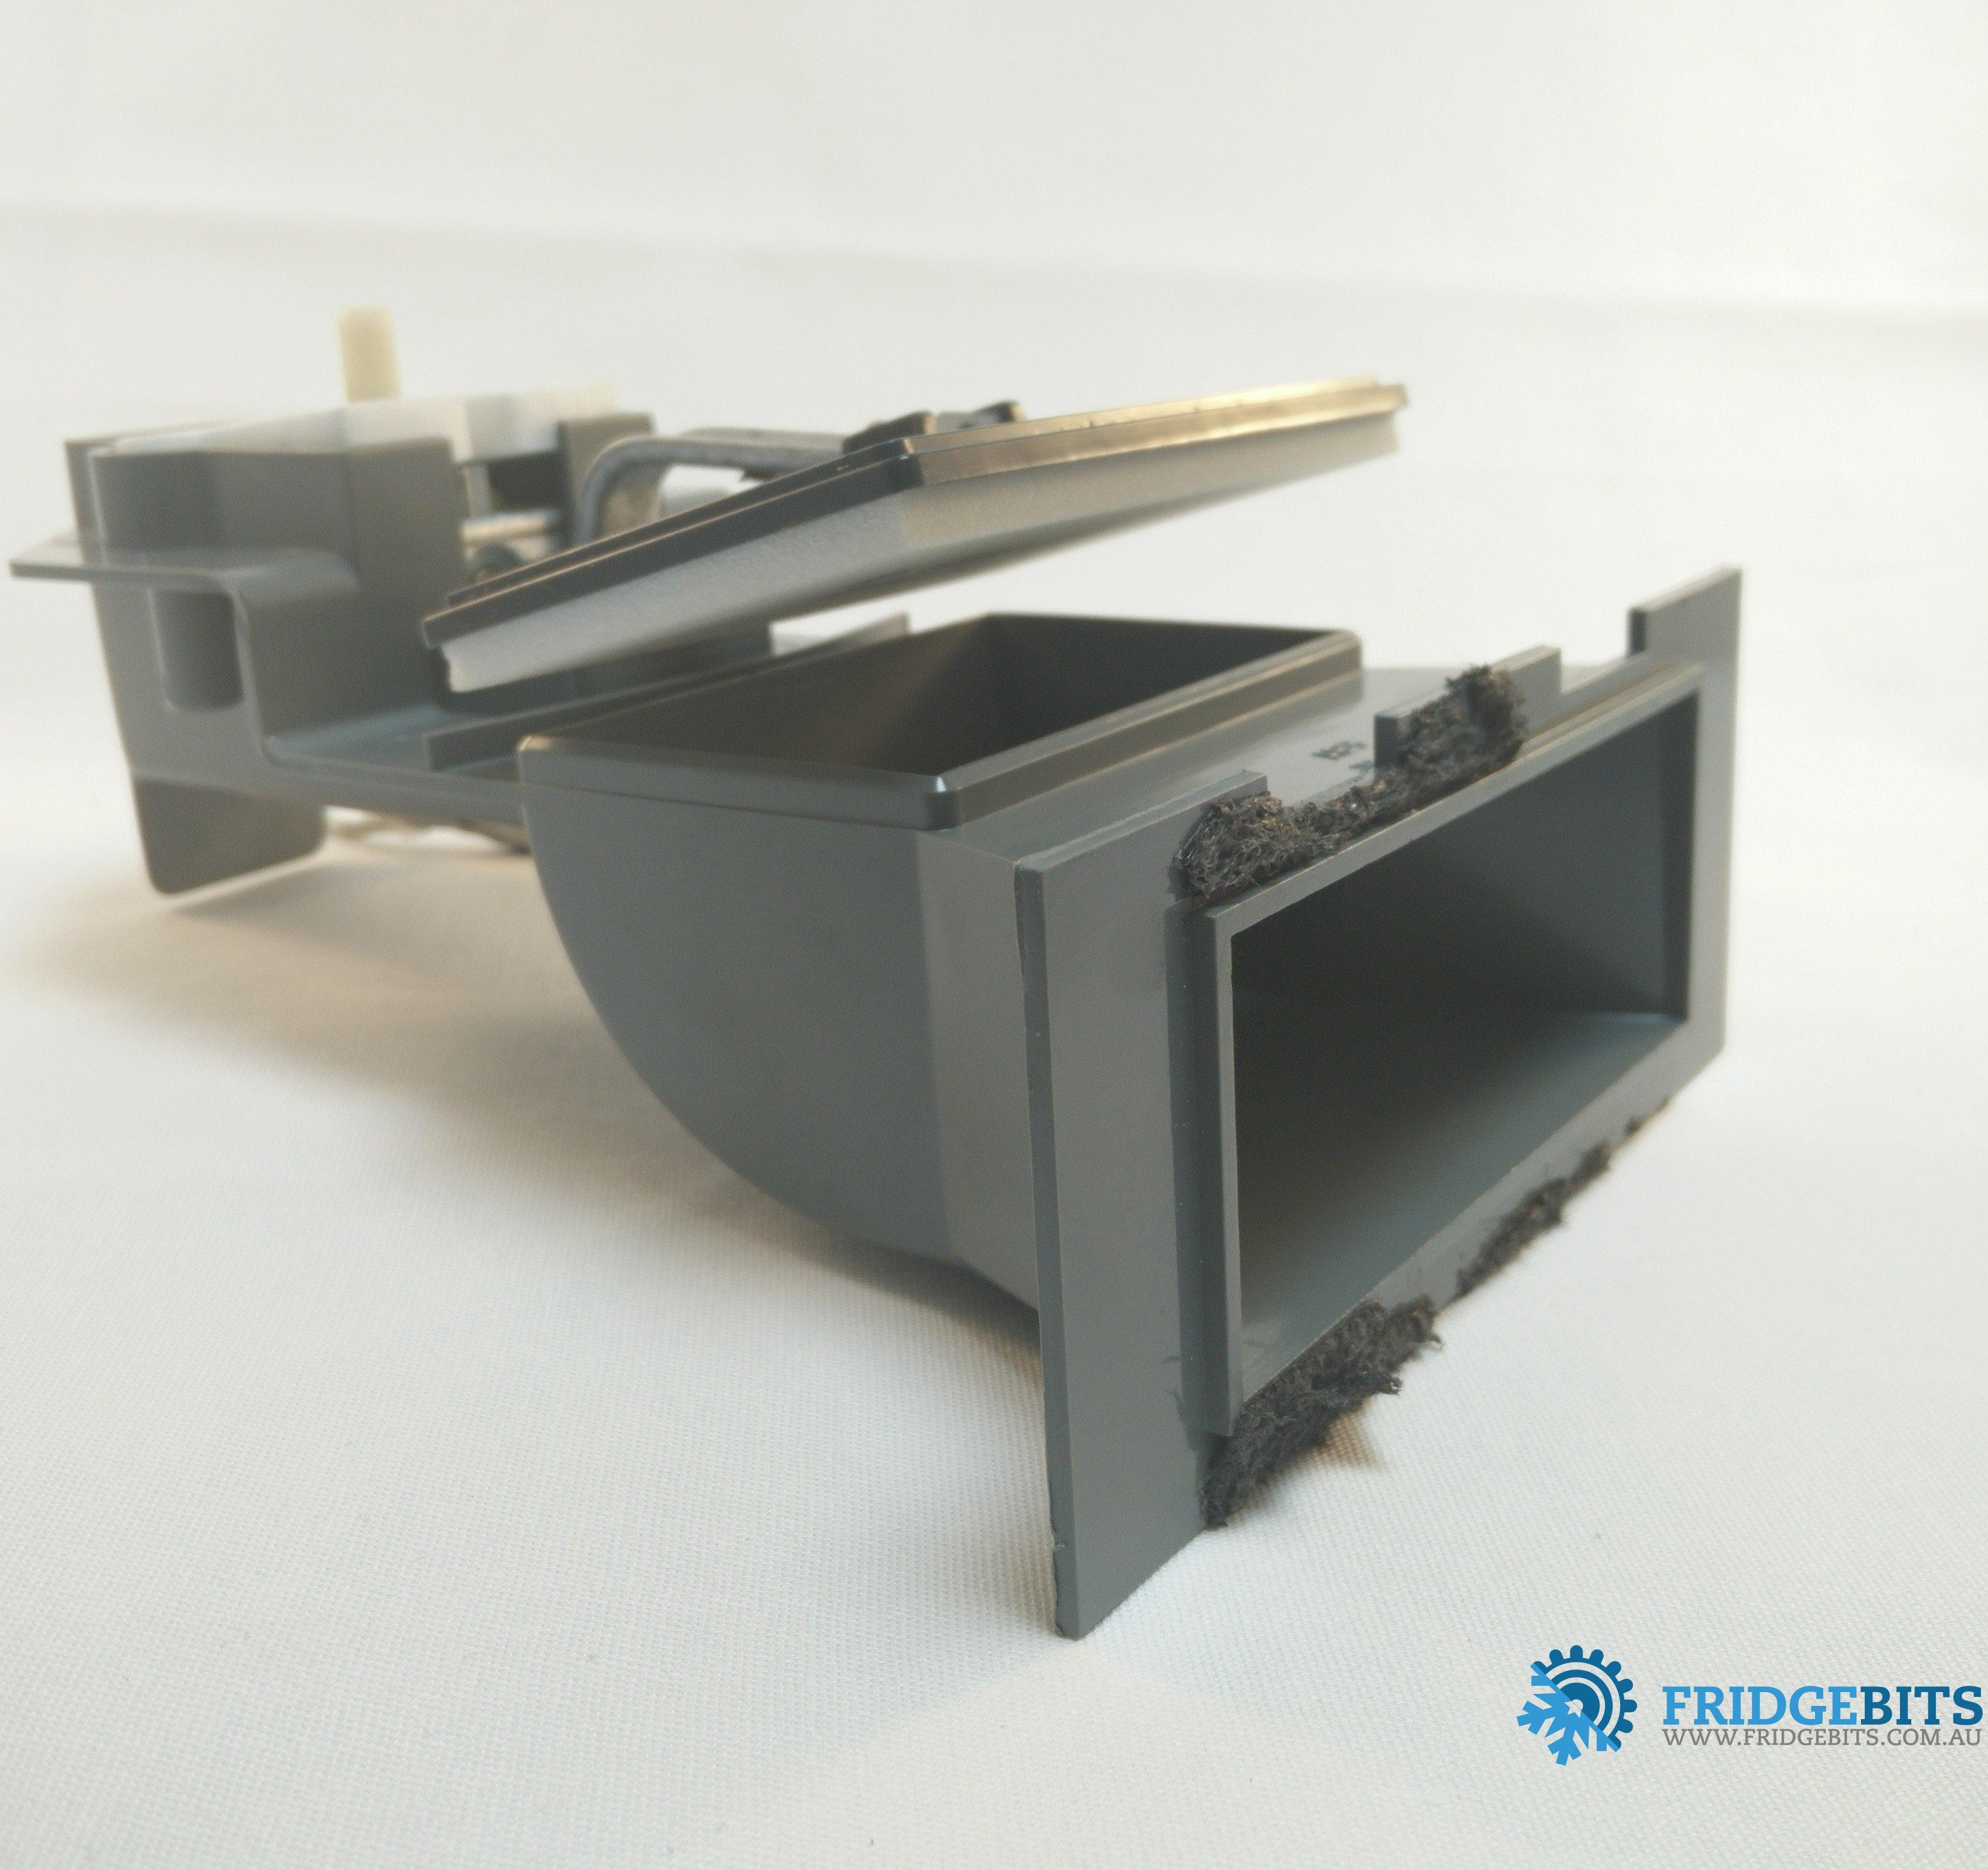 Whirlpool Samsung Refrigerator Thermostat Damper Assembly